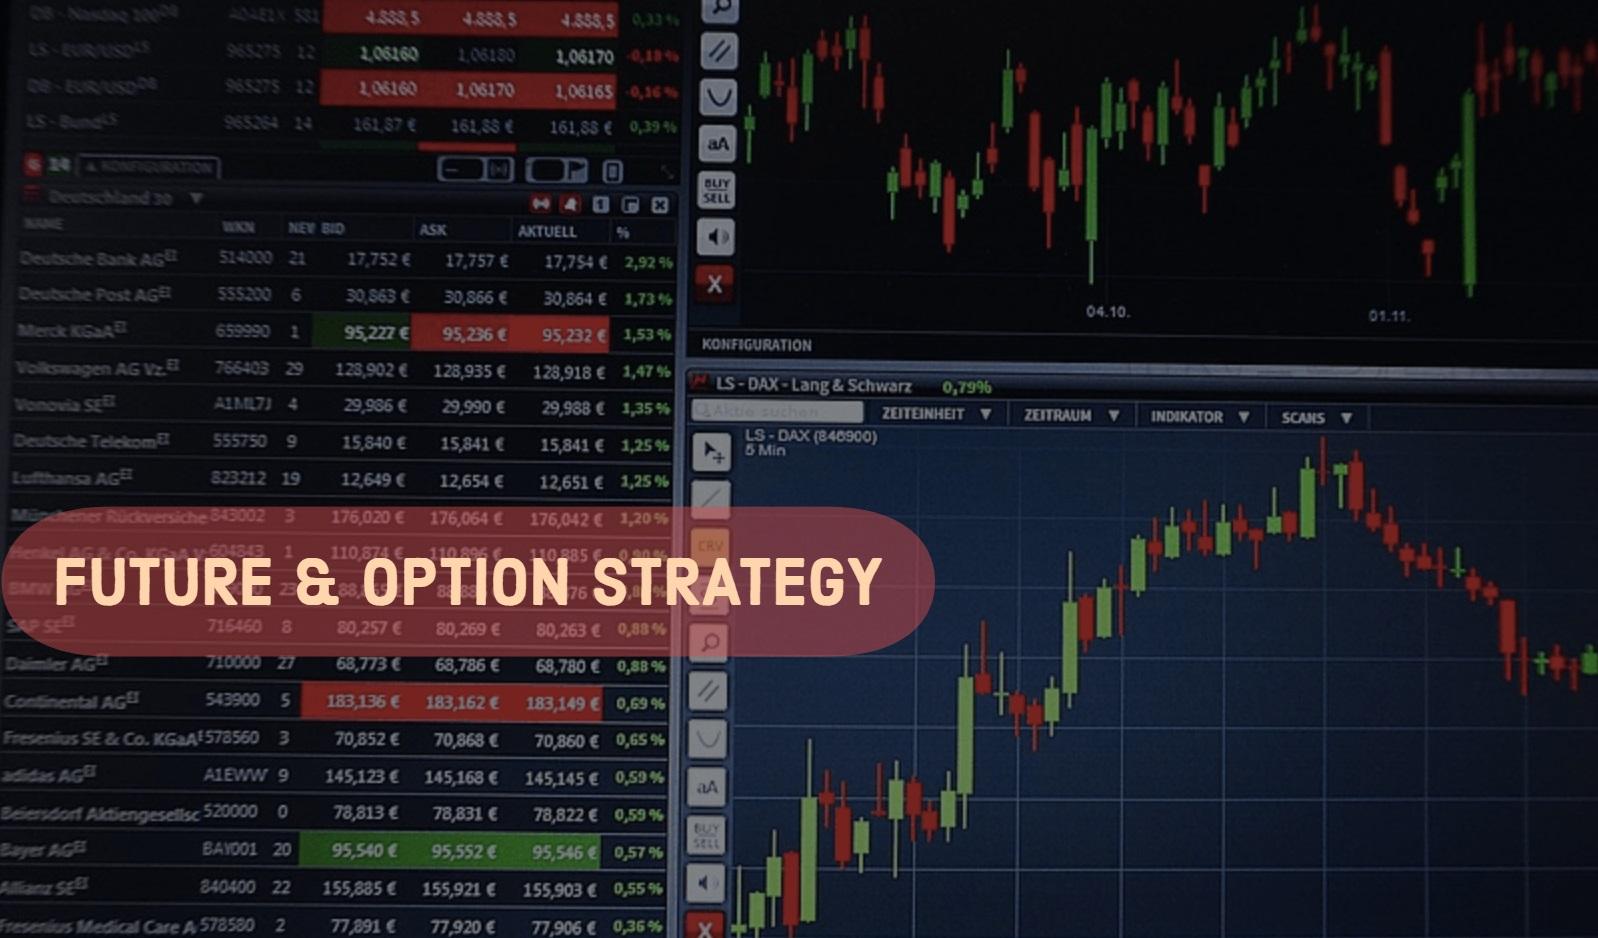 Option trading advisory service